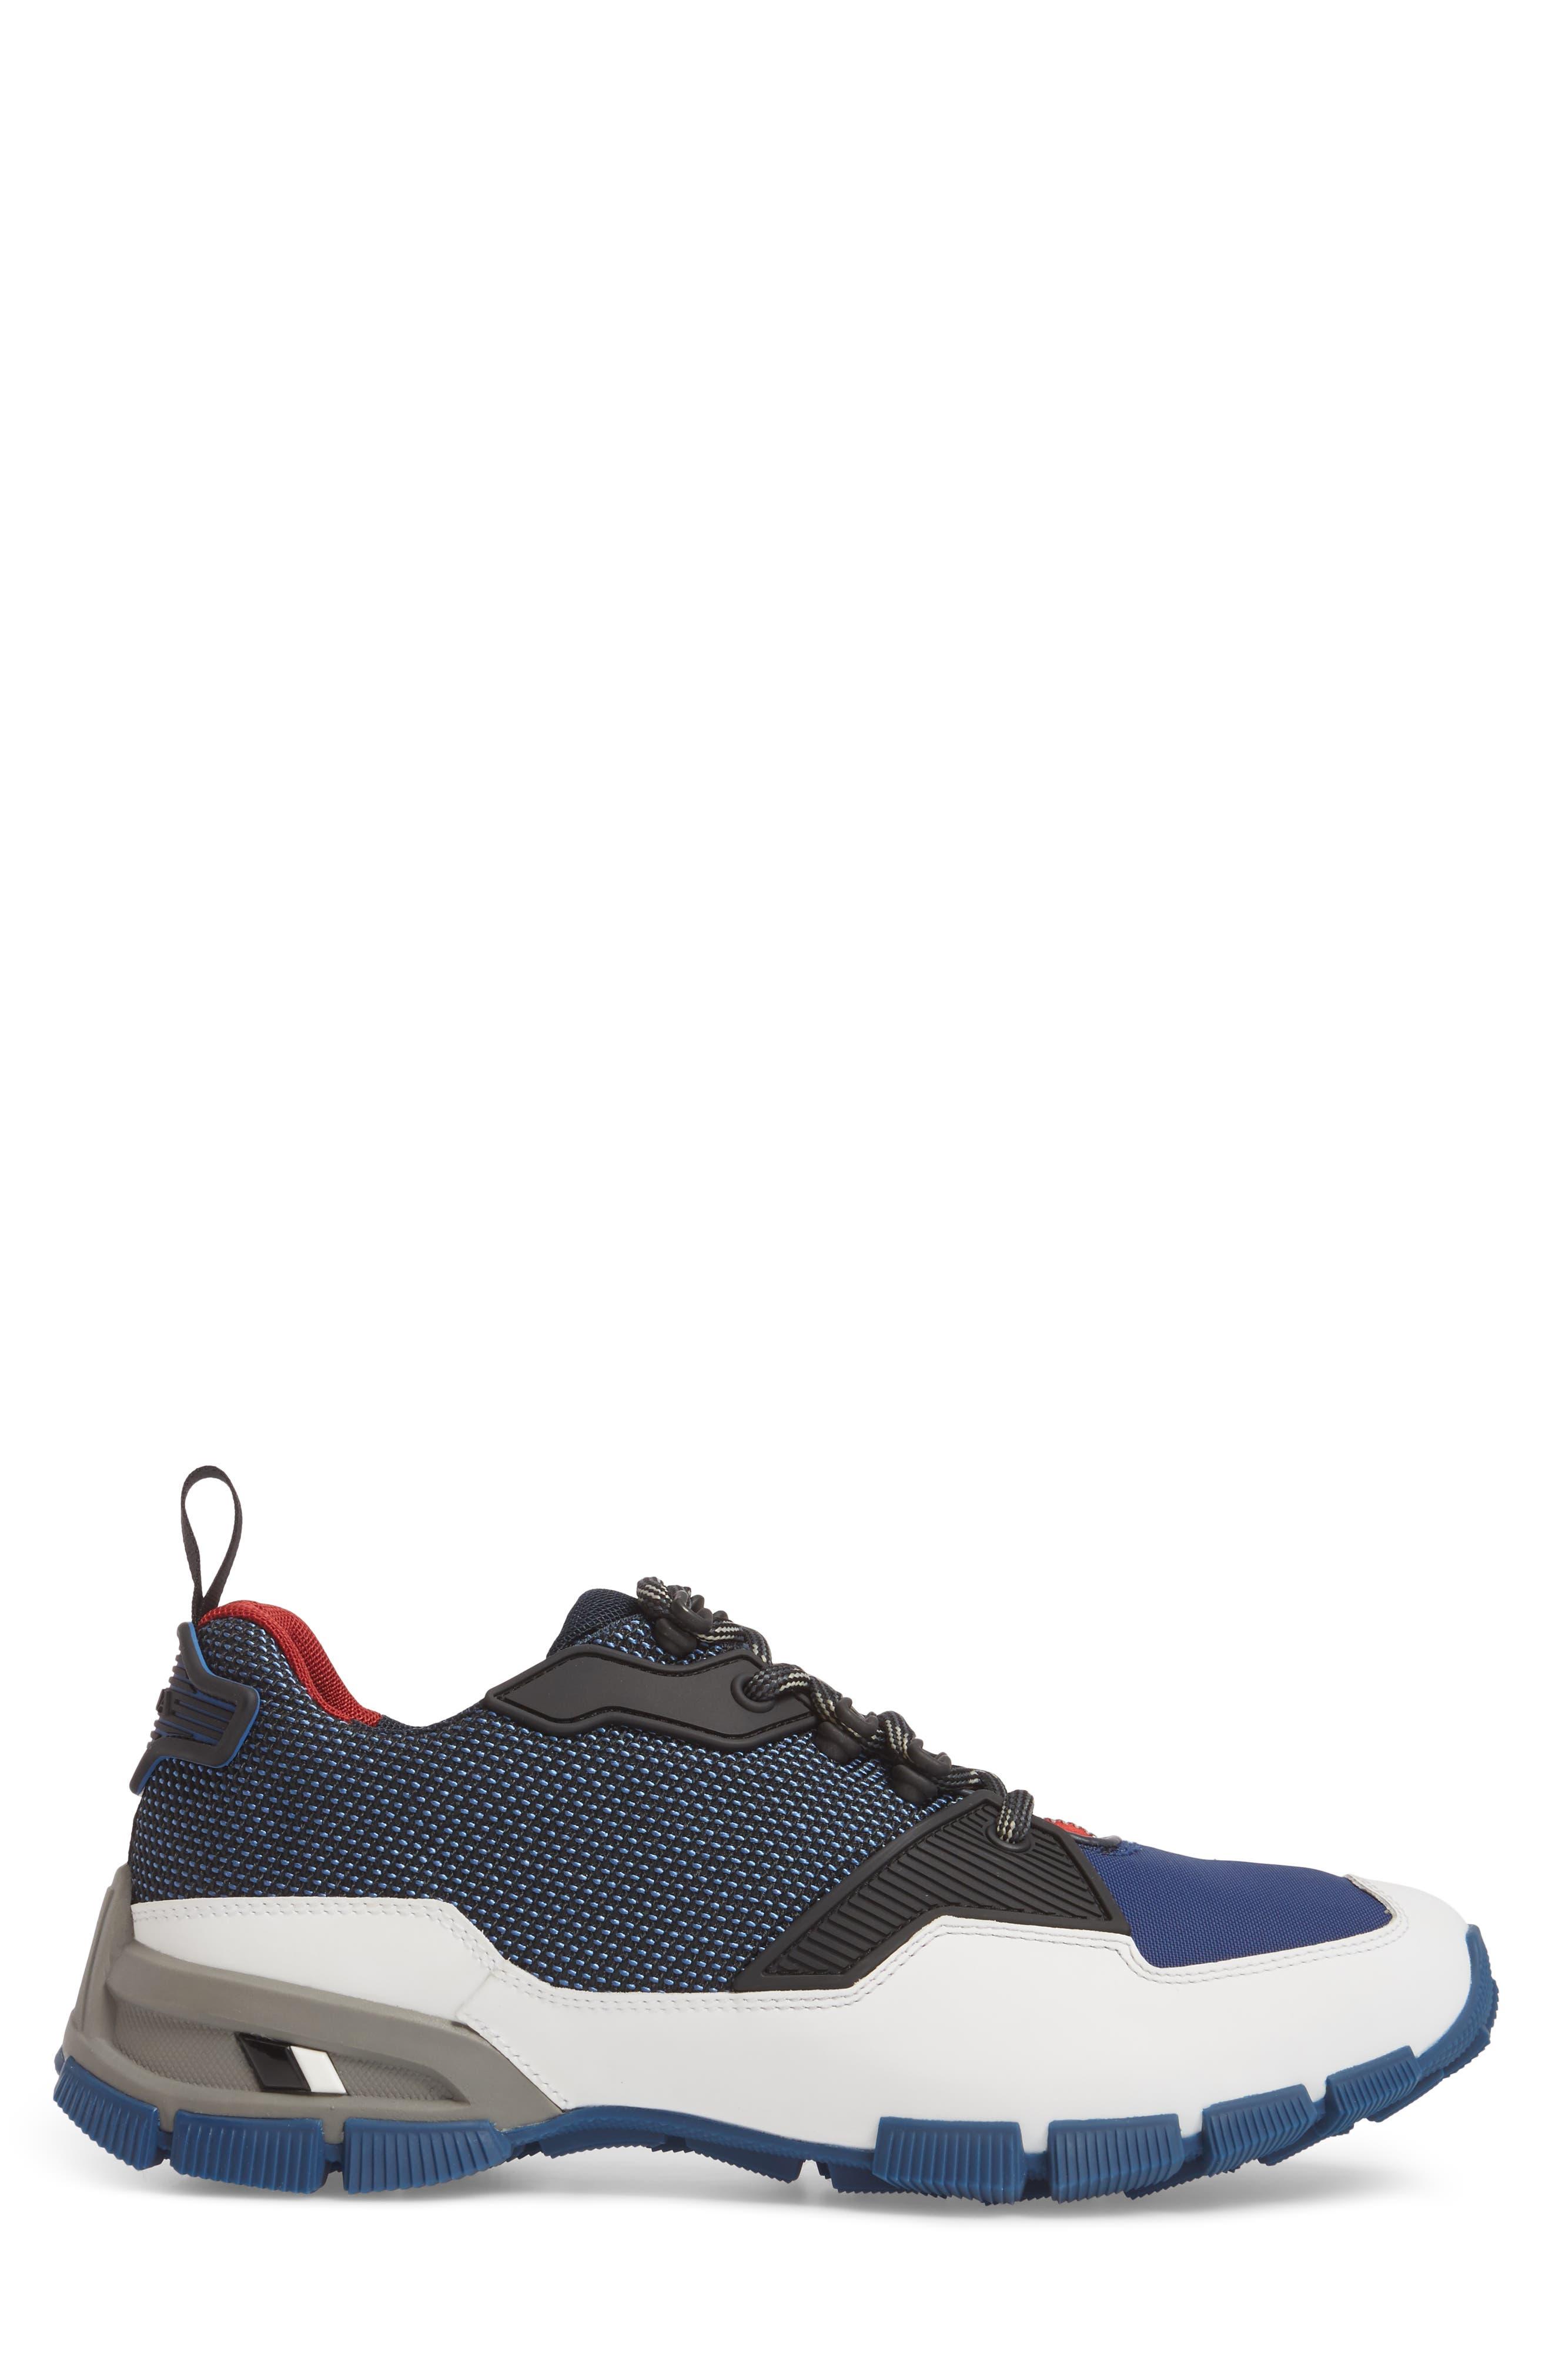 Alternate Image 3  - Prada Linea Rossa Tech Lug Sneaker (Men)